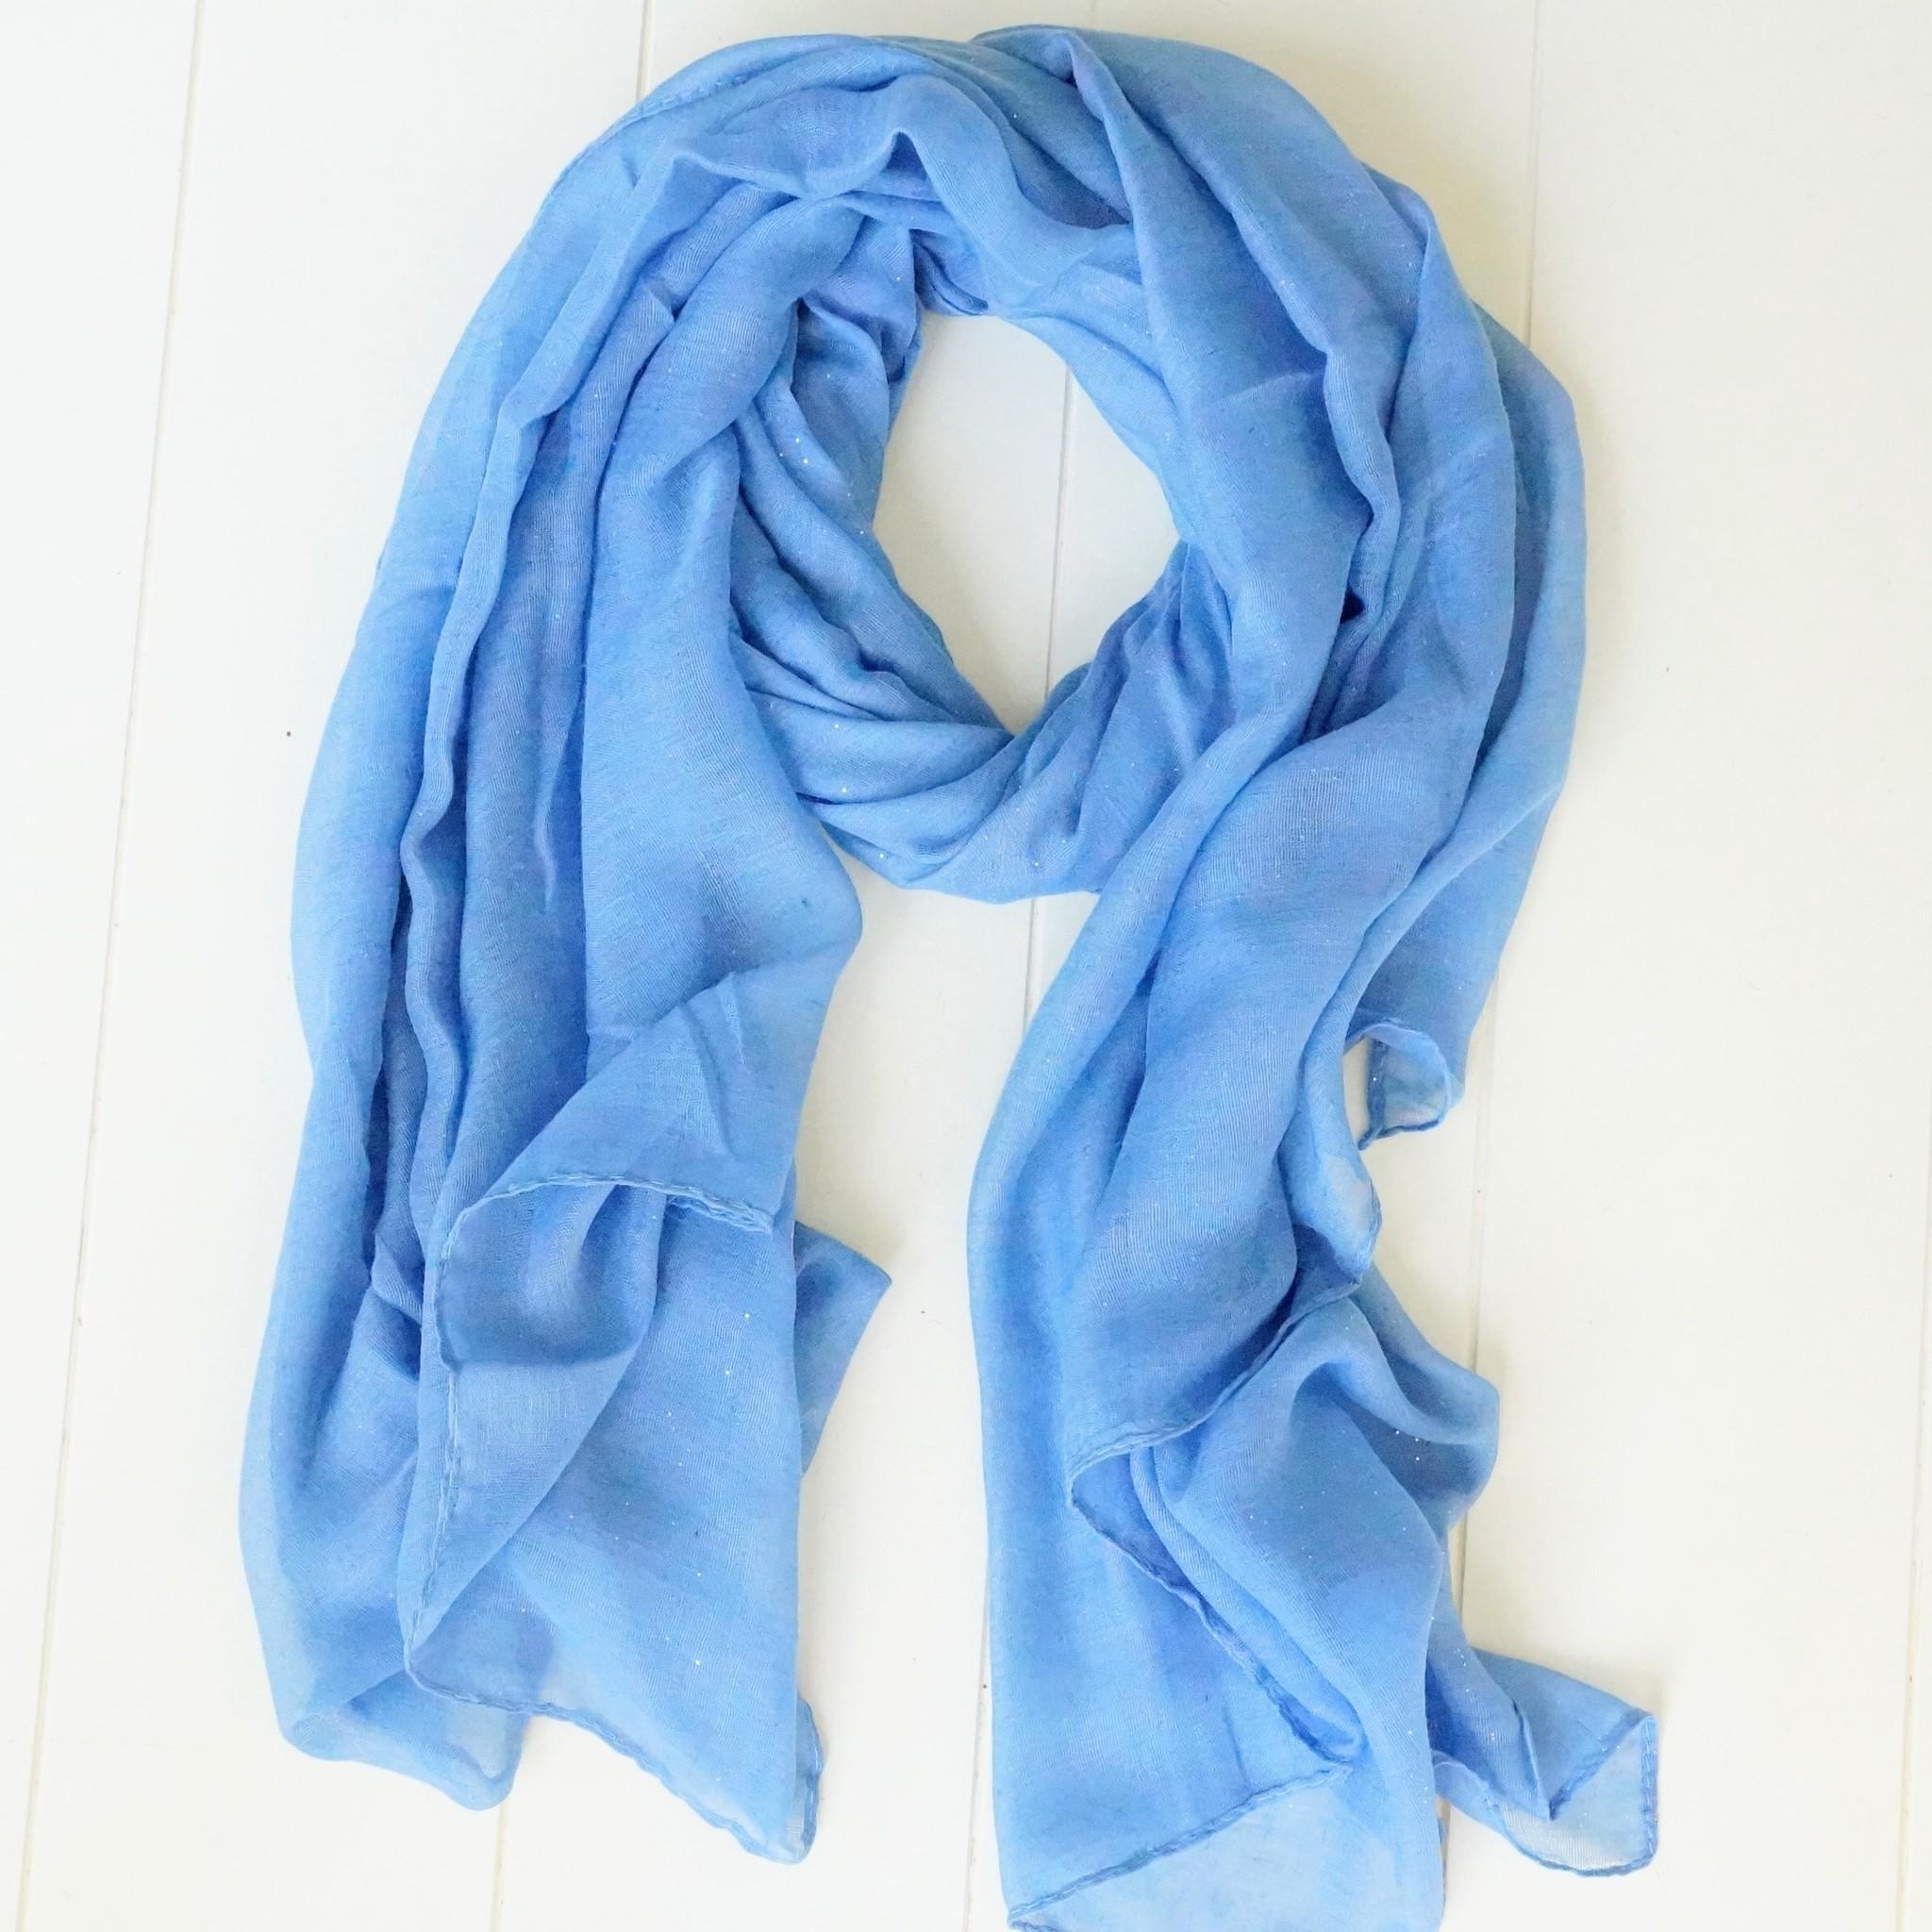 Klassiek blauwe sjaal